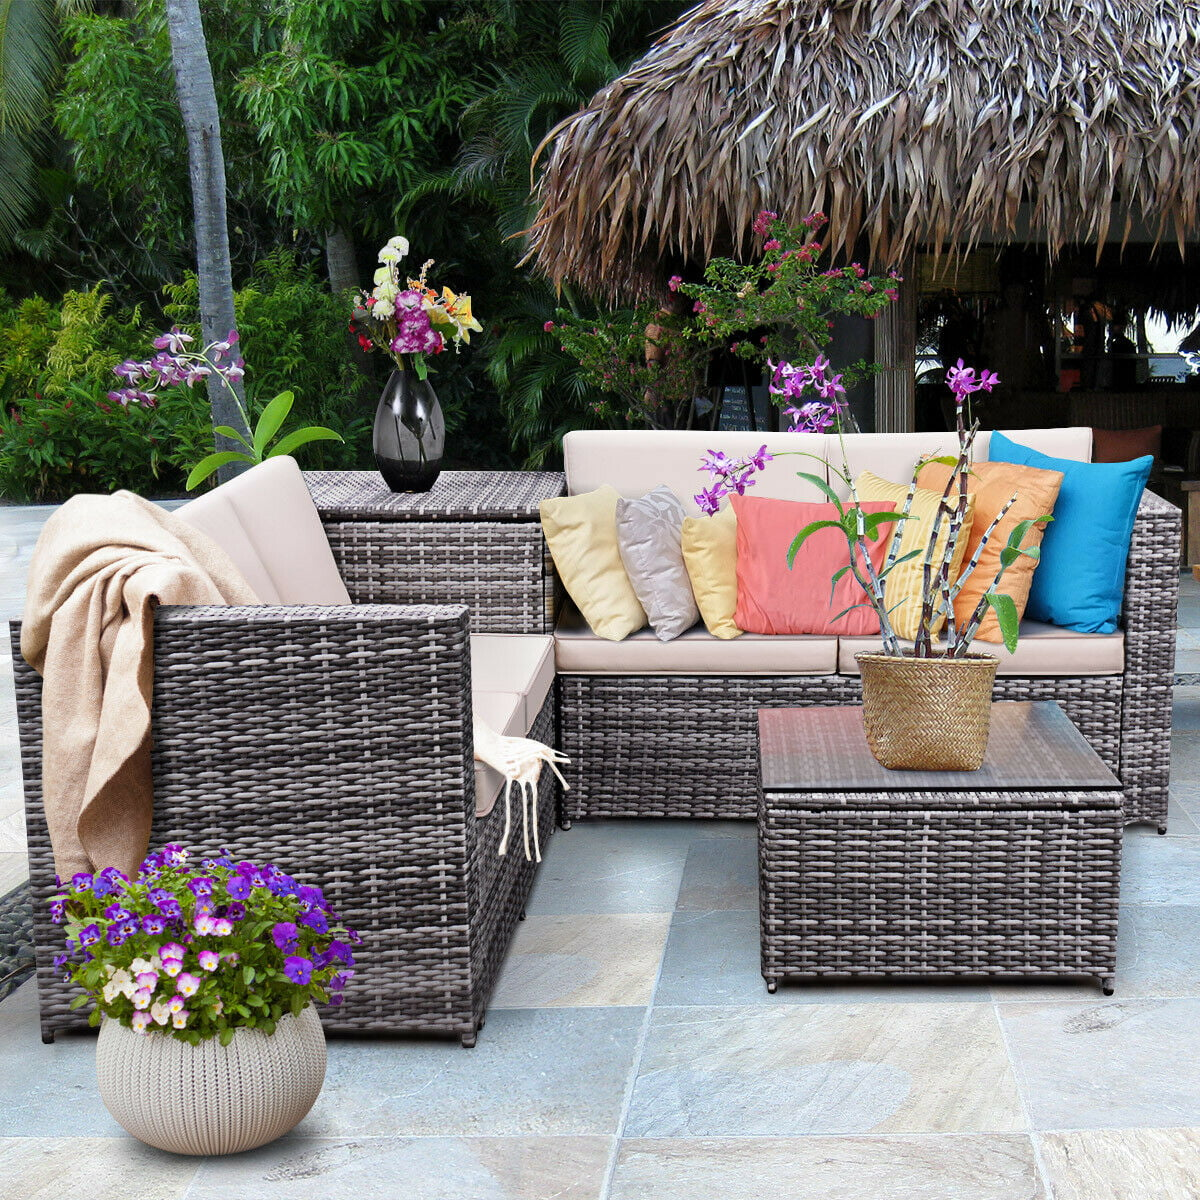 costway 4pcs patio rattan wicker furniture set sofa loveseat cushioned with storage box